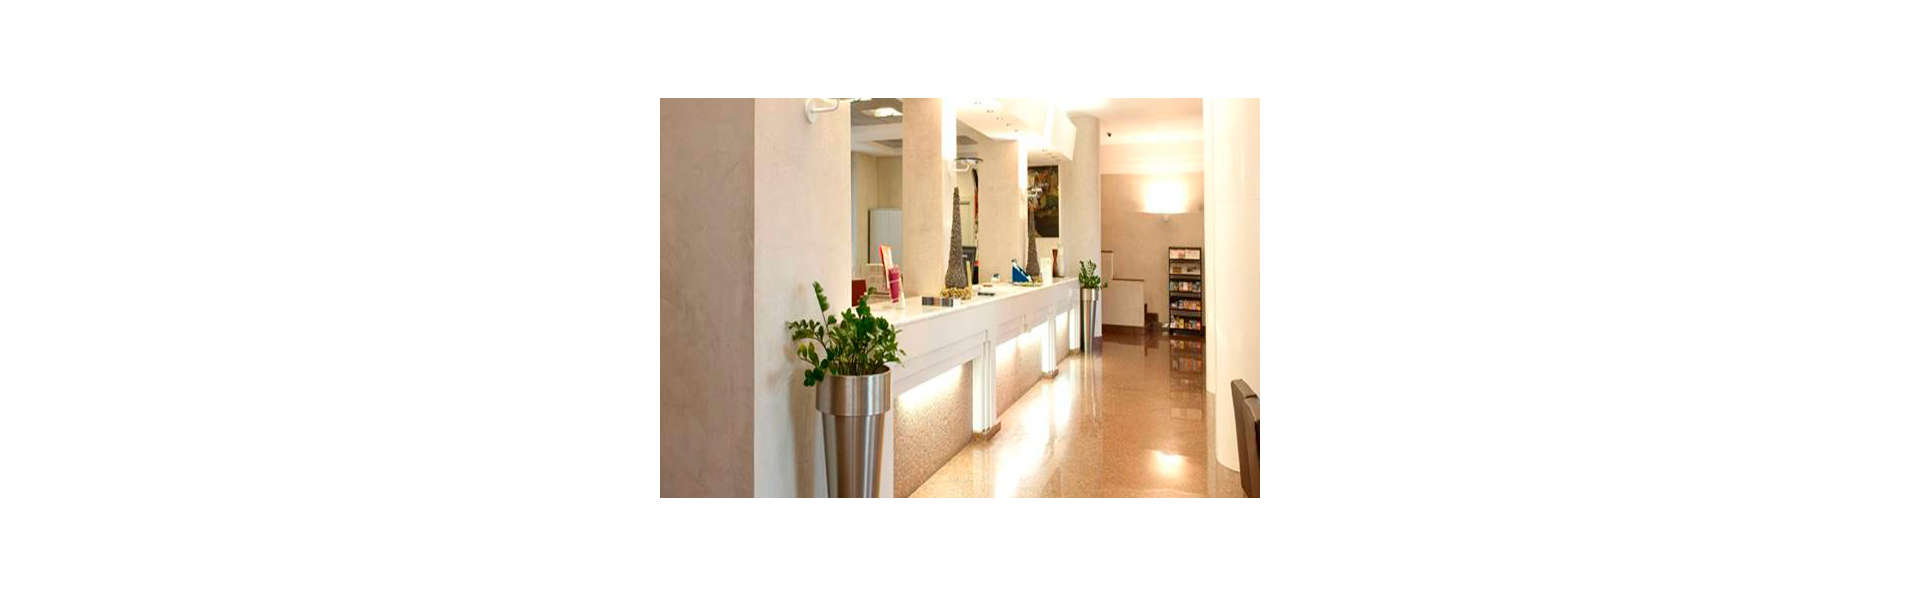 Hotel San Pietro - EDIT_LOBBY_01.jpg